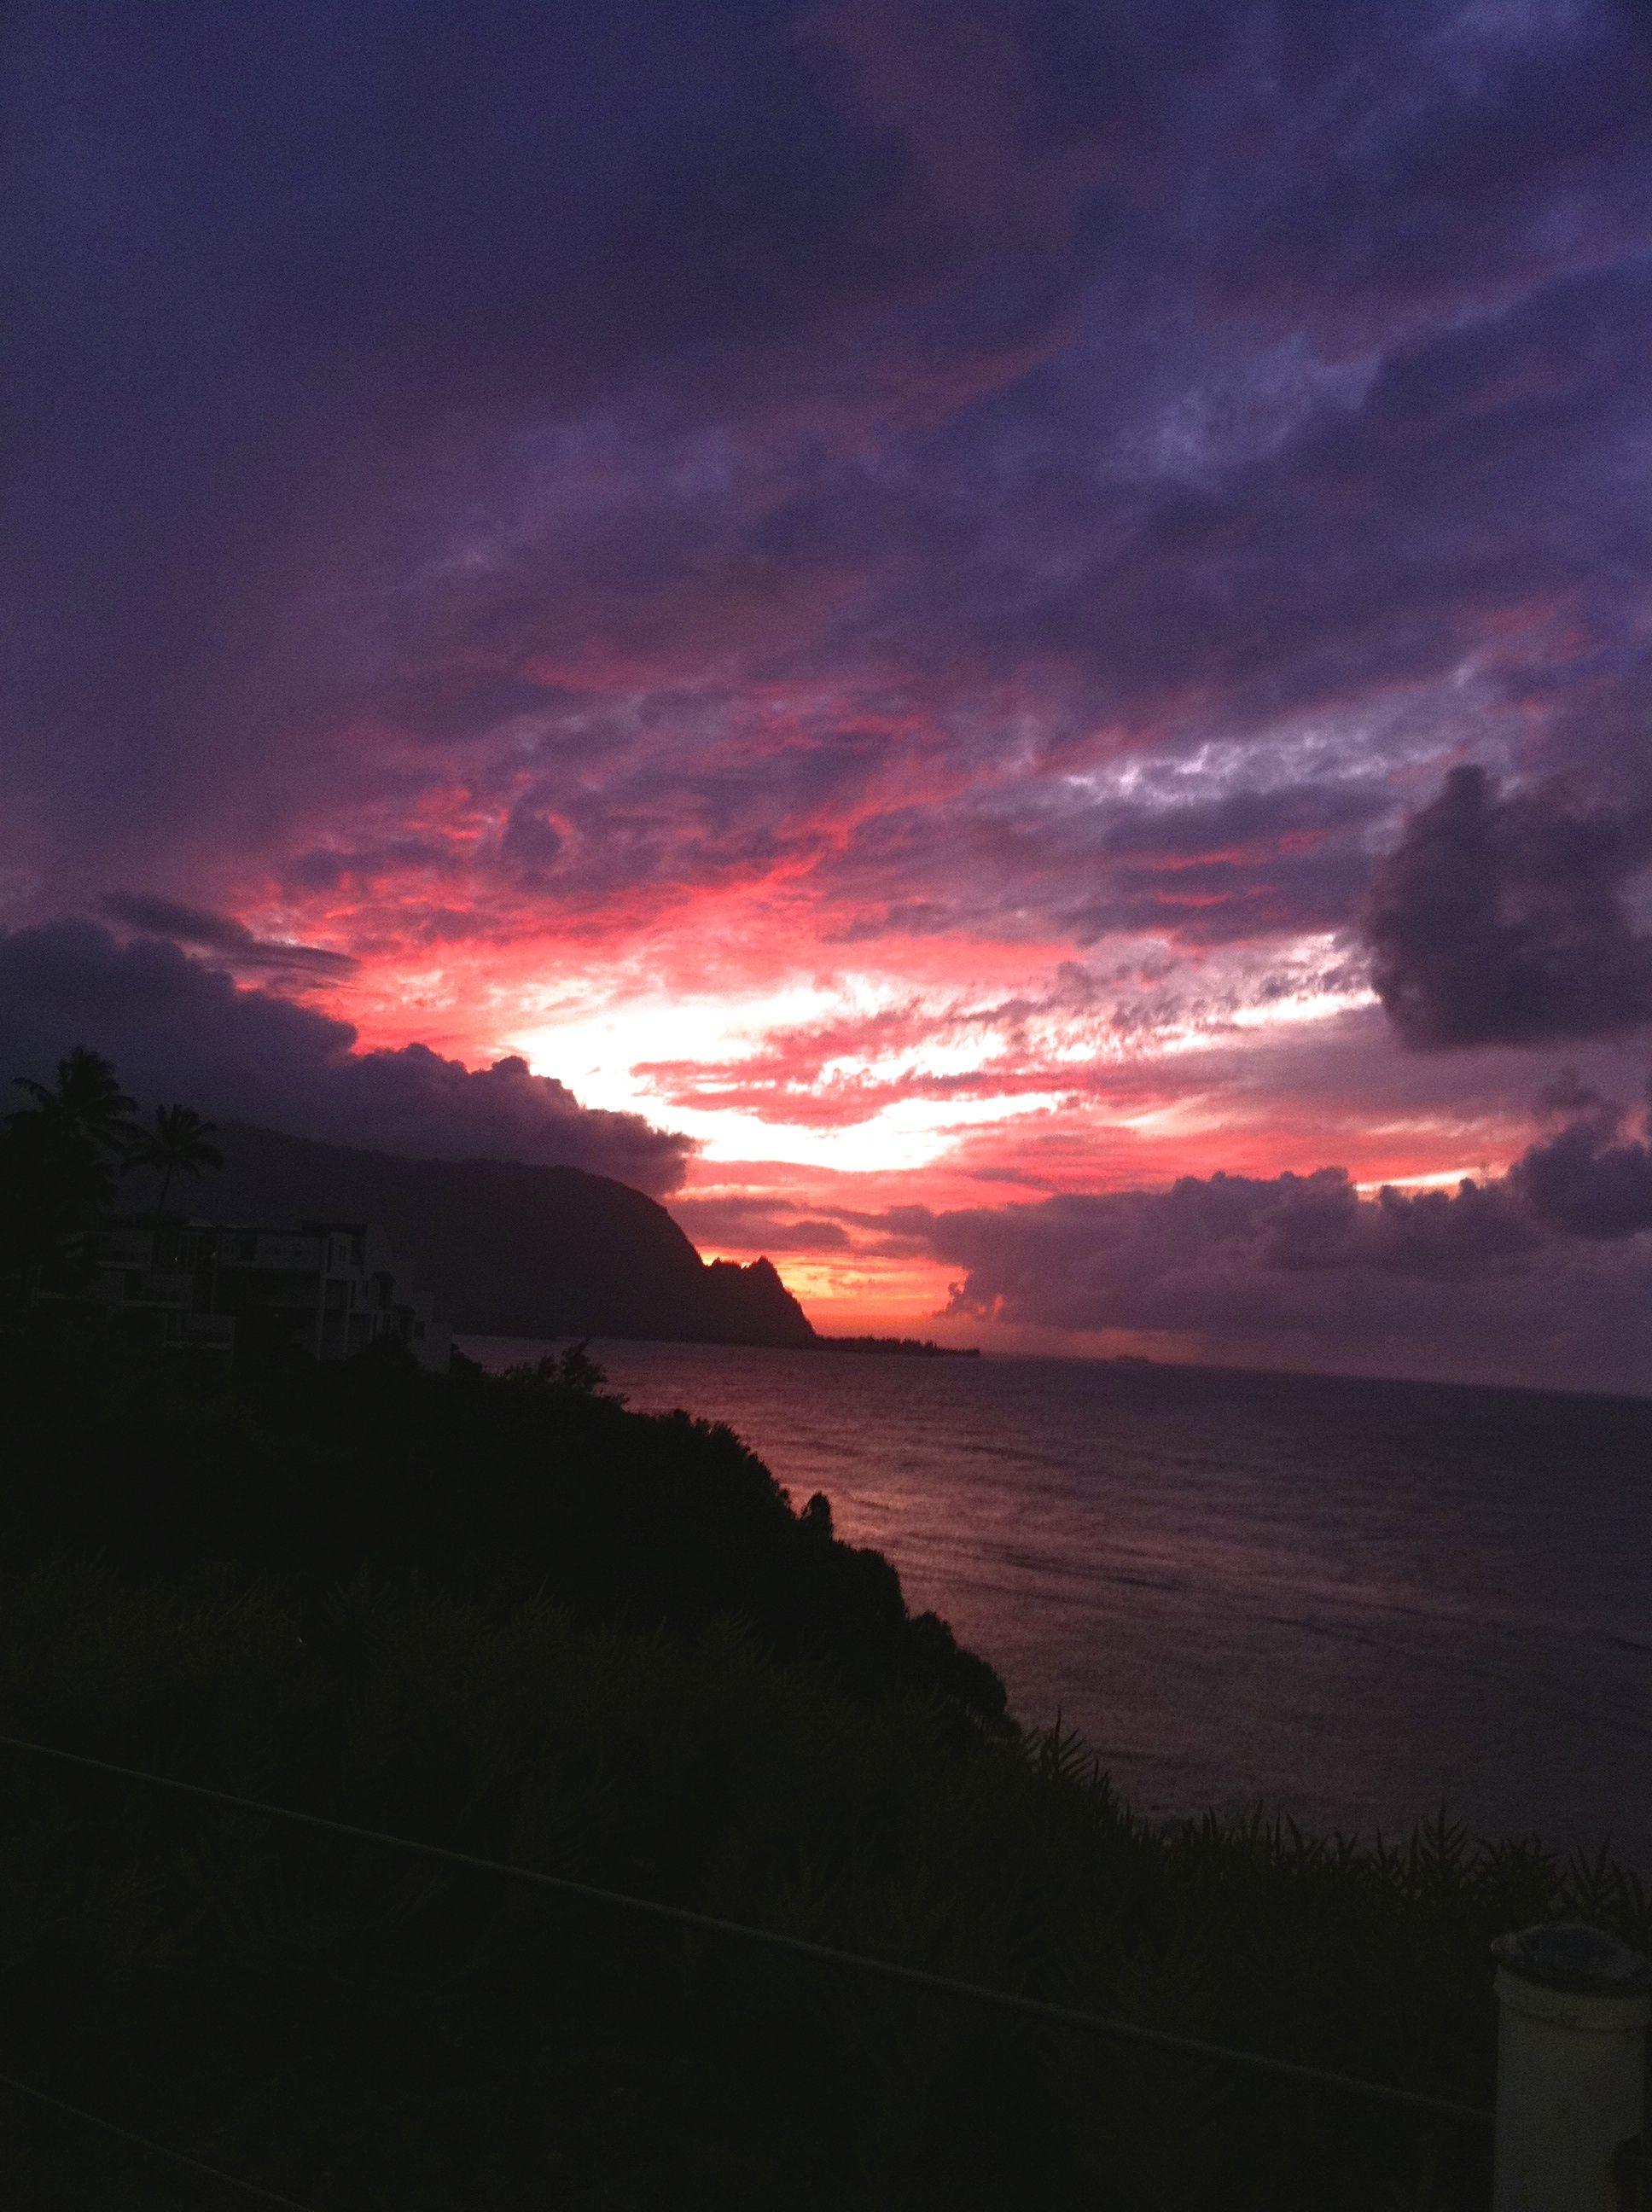 The last rays of light over Bali Hai, near Hanalei Bay, Kauai. A little drama?